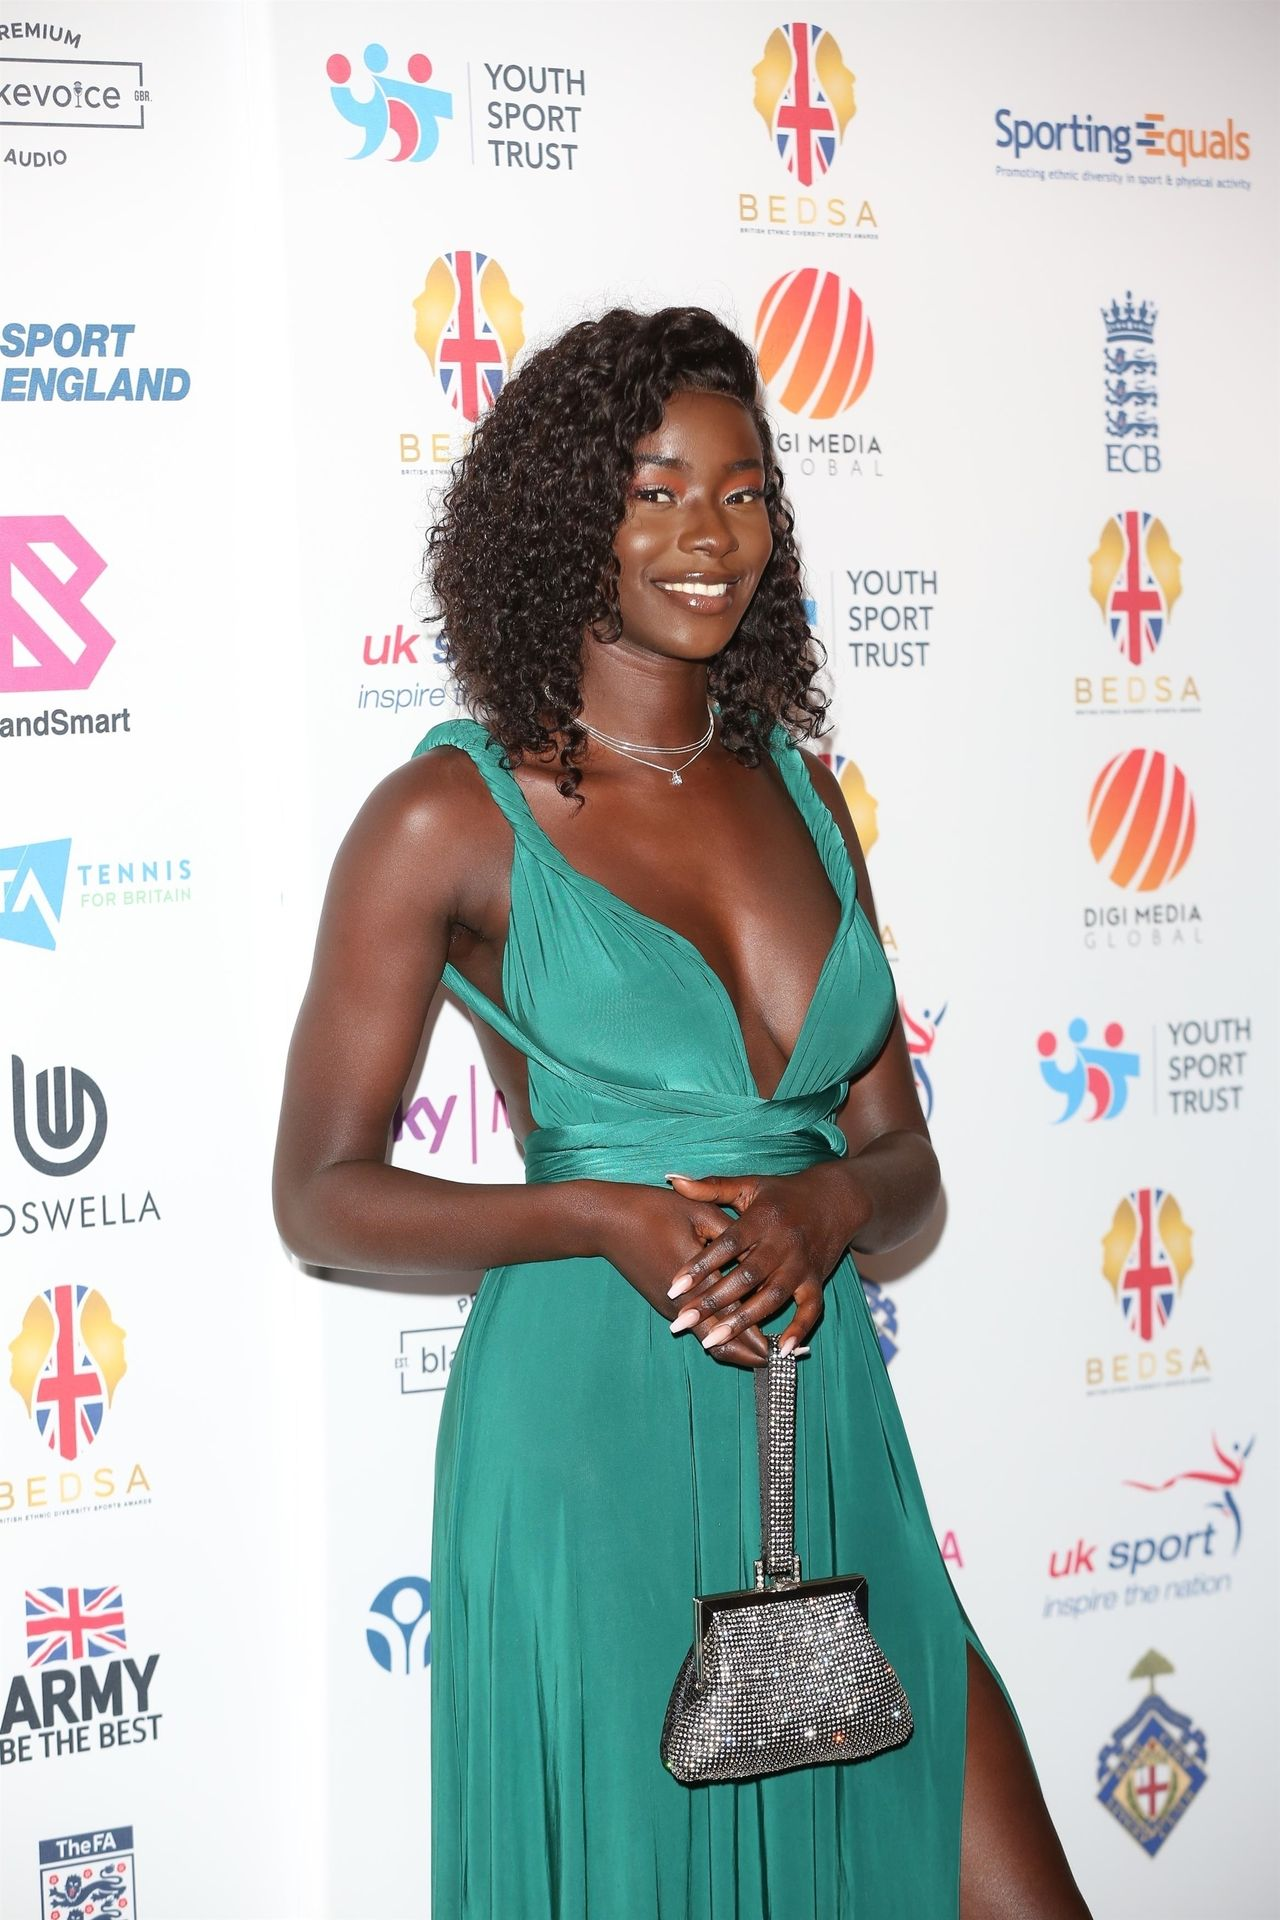 Mike Boateng & Priscilla Anyabu Are Seen At British Ethnic Diversity Sports Awards 0027